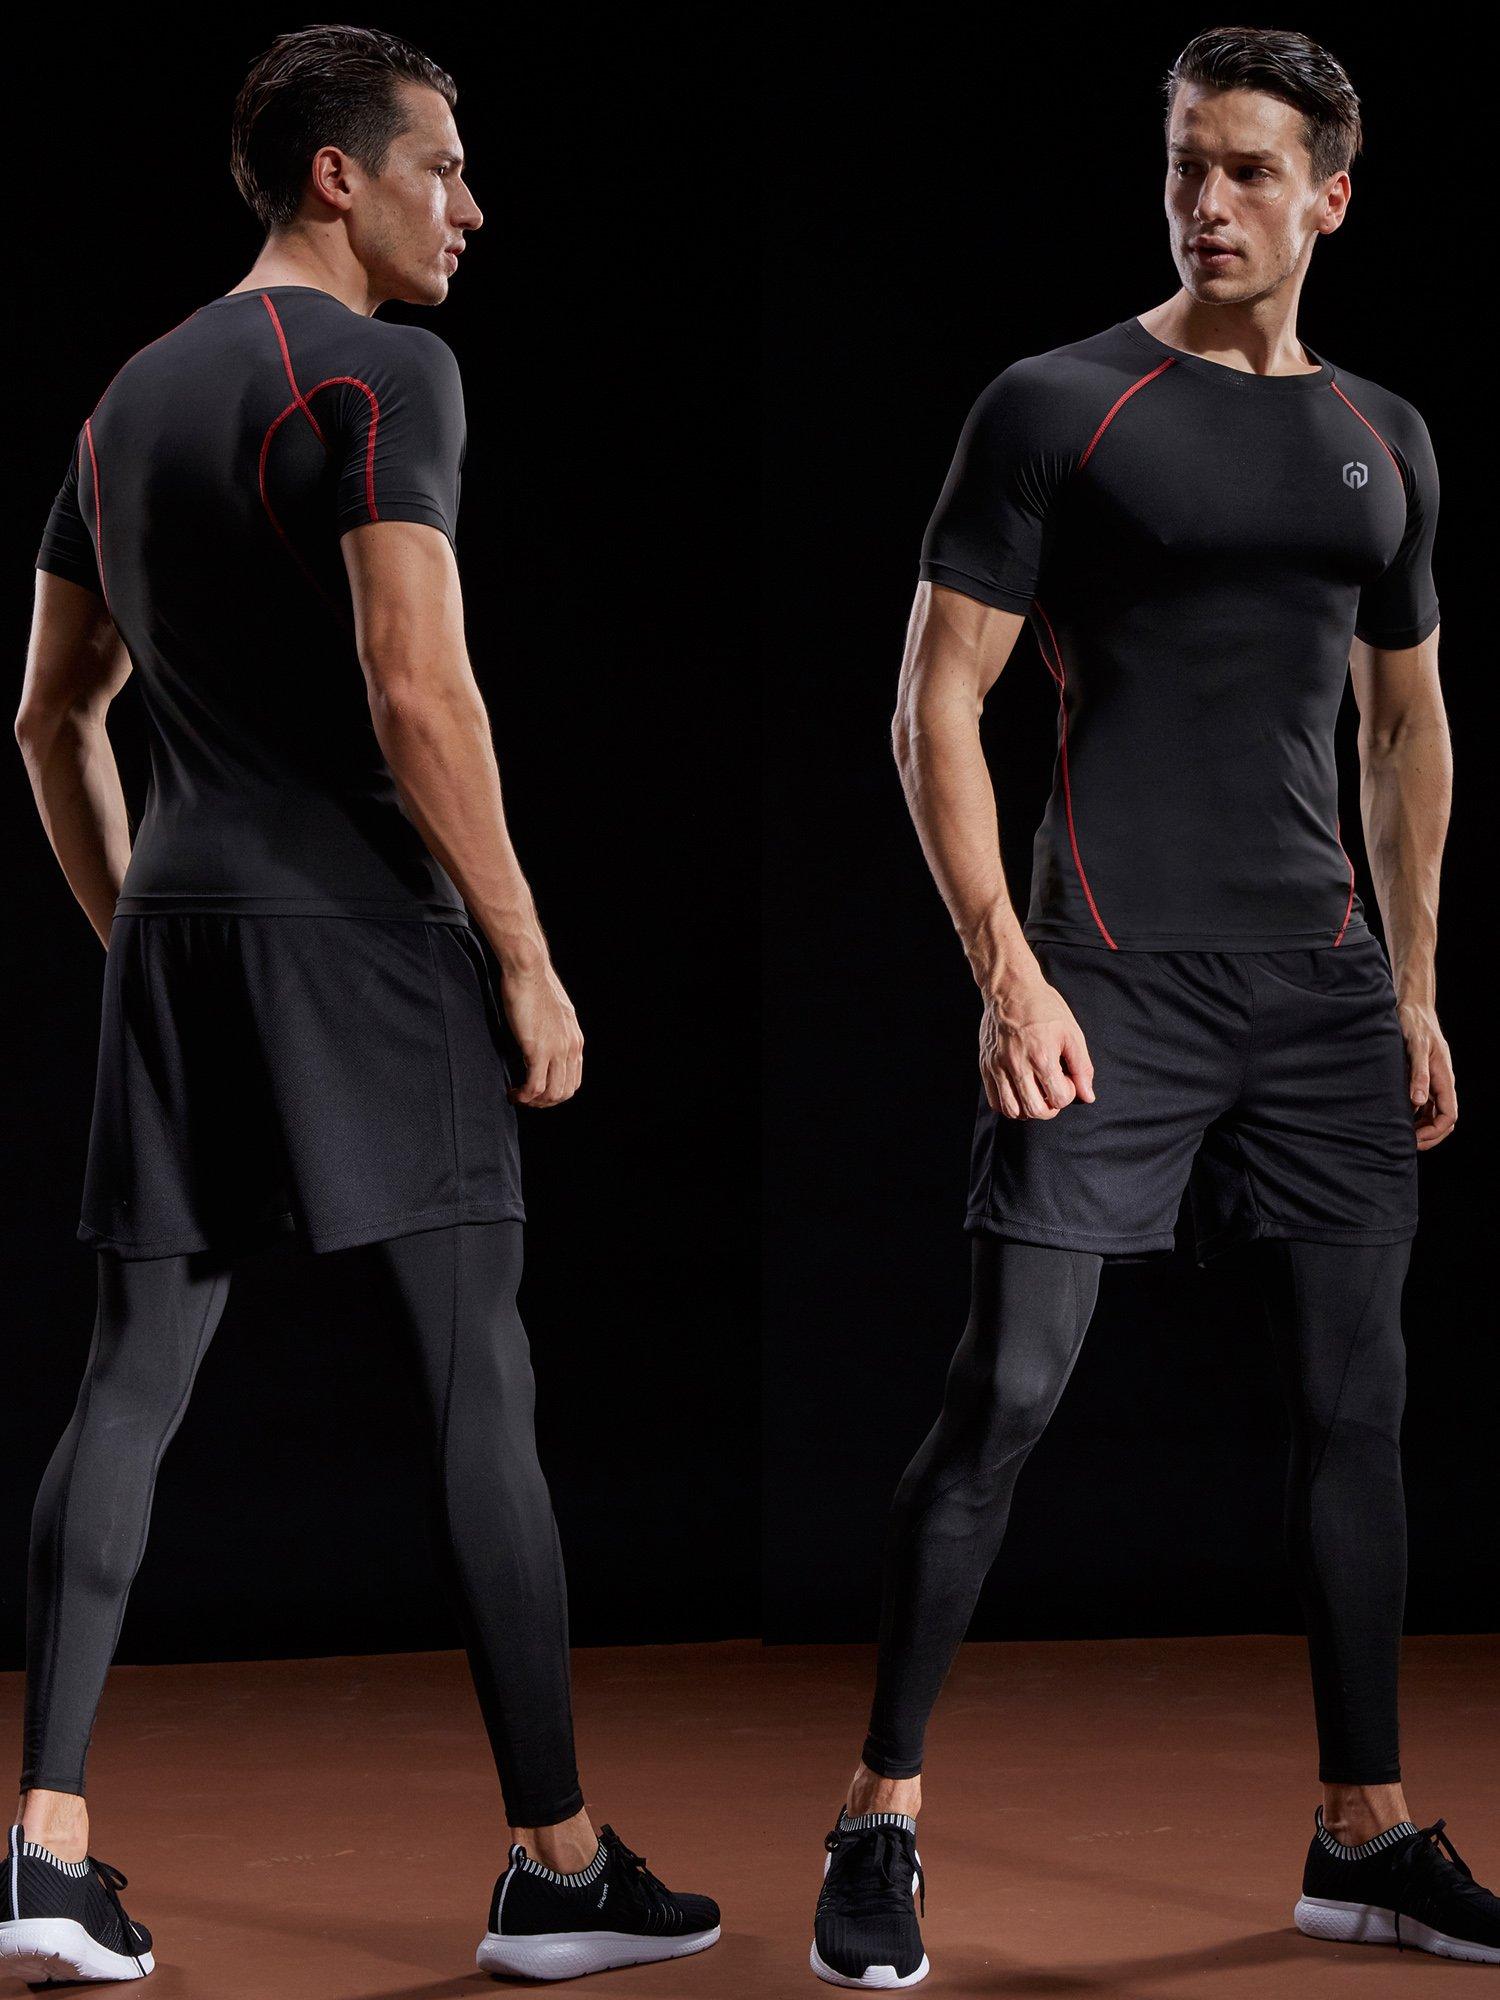 Neleus Men's Compression Baselayer Athletic Workout T Shirts,5022,One Piece,Black(red Striped),US S,EU M by Neleus (Image #2)